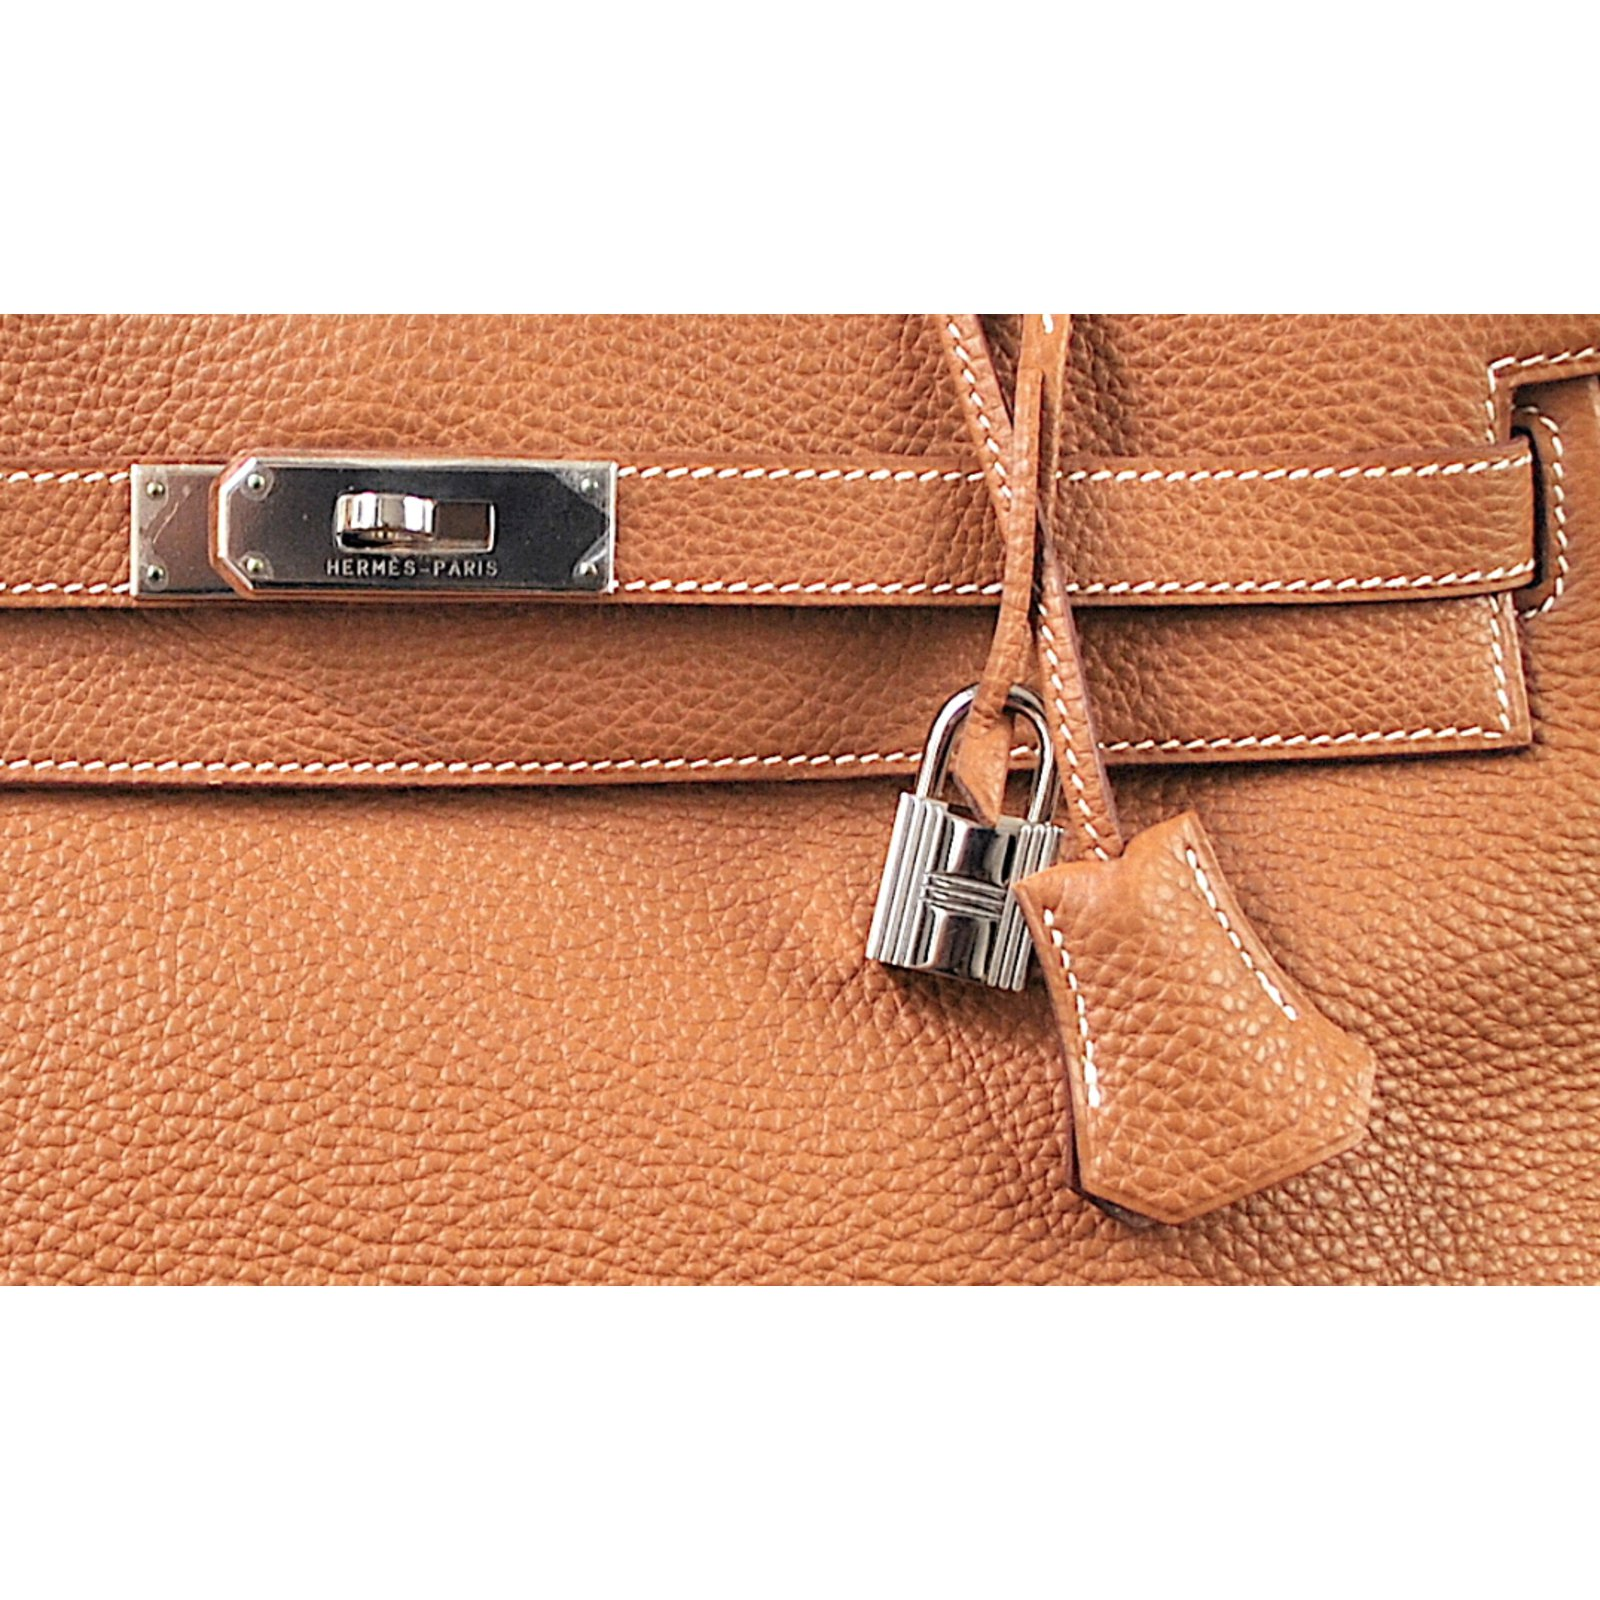 5dad0b86d2 Hermès HERMES Kelly 35 cm Togo Gold Handbags Leather Light brown ref.47061  - Joli Closet